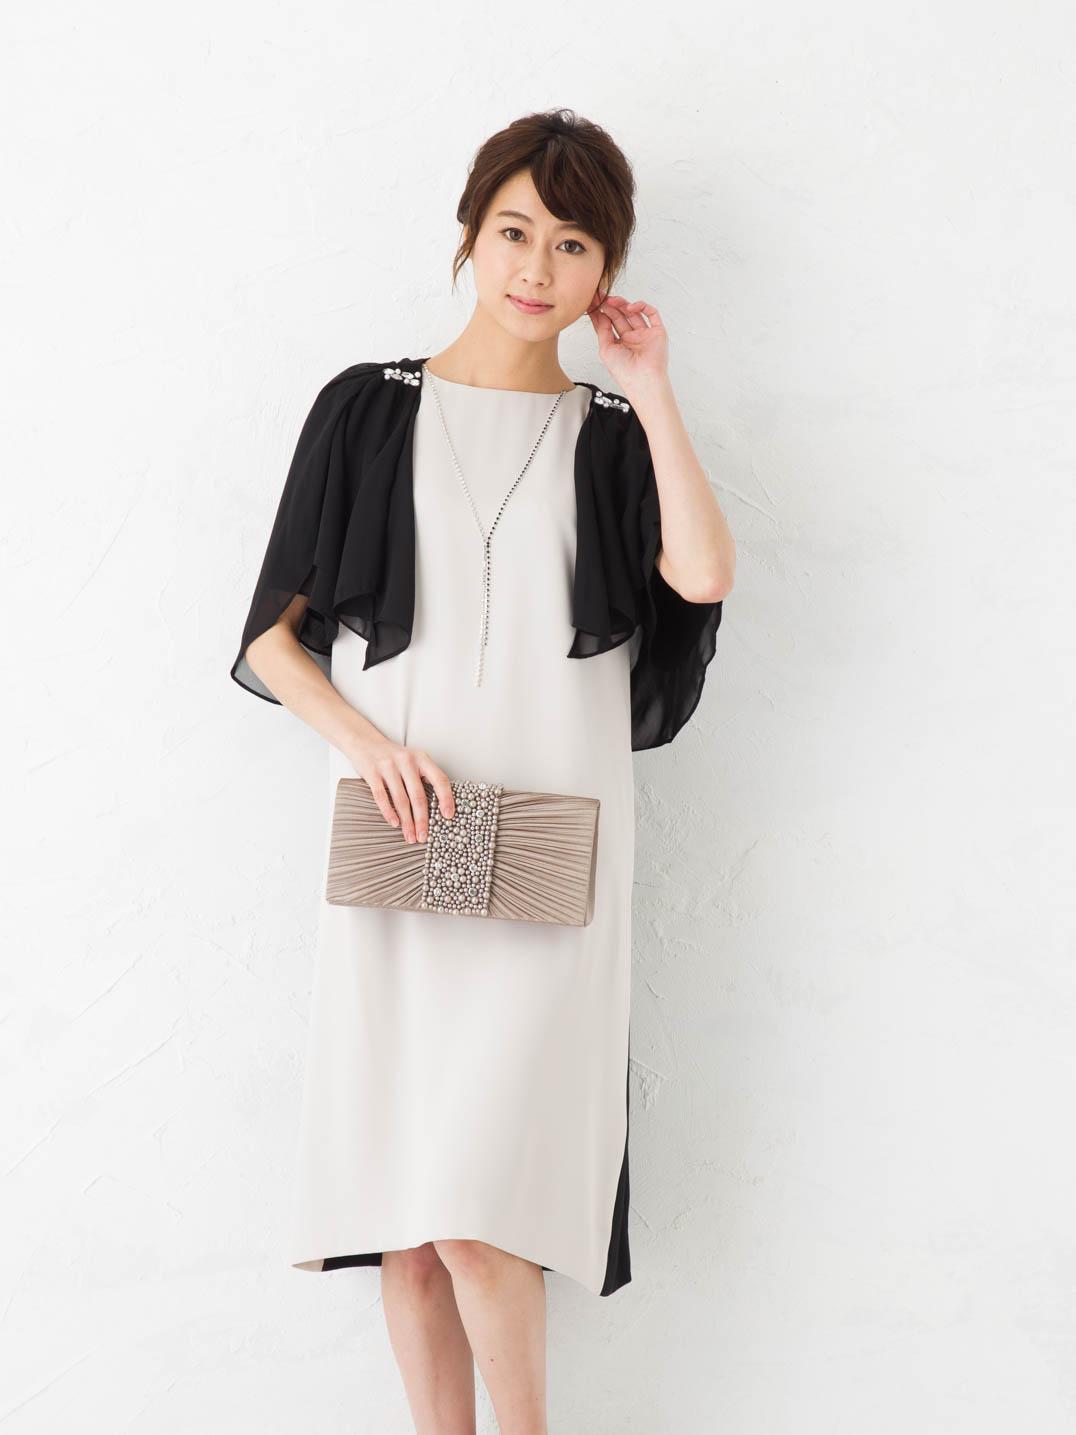 REPLETE ドレス4点セット / Mサイズ (DFC0022)